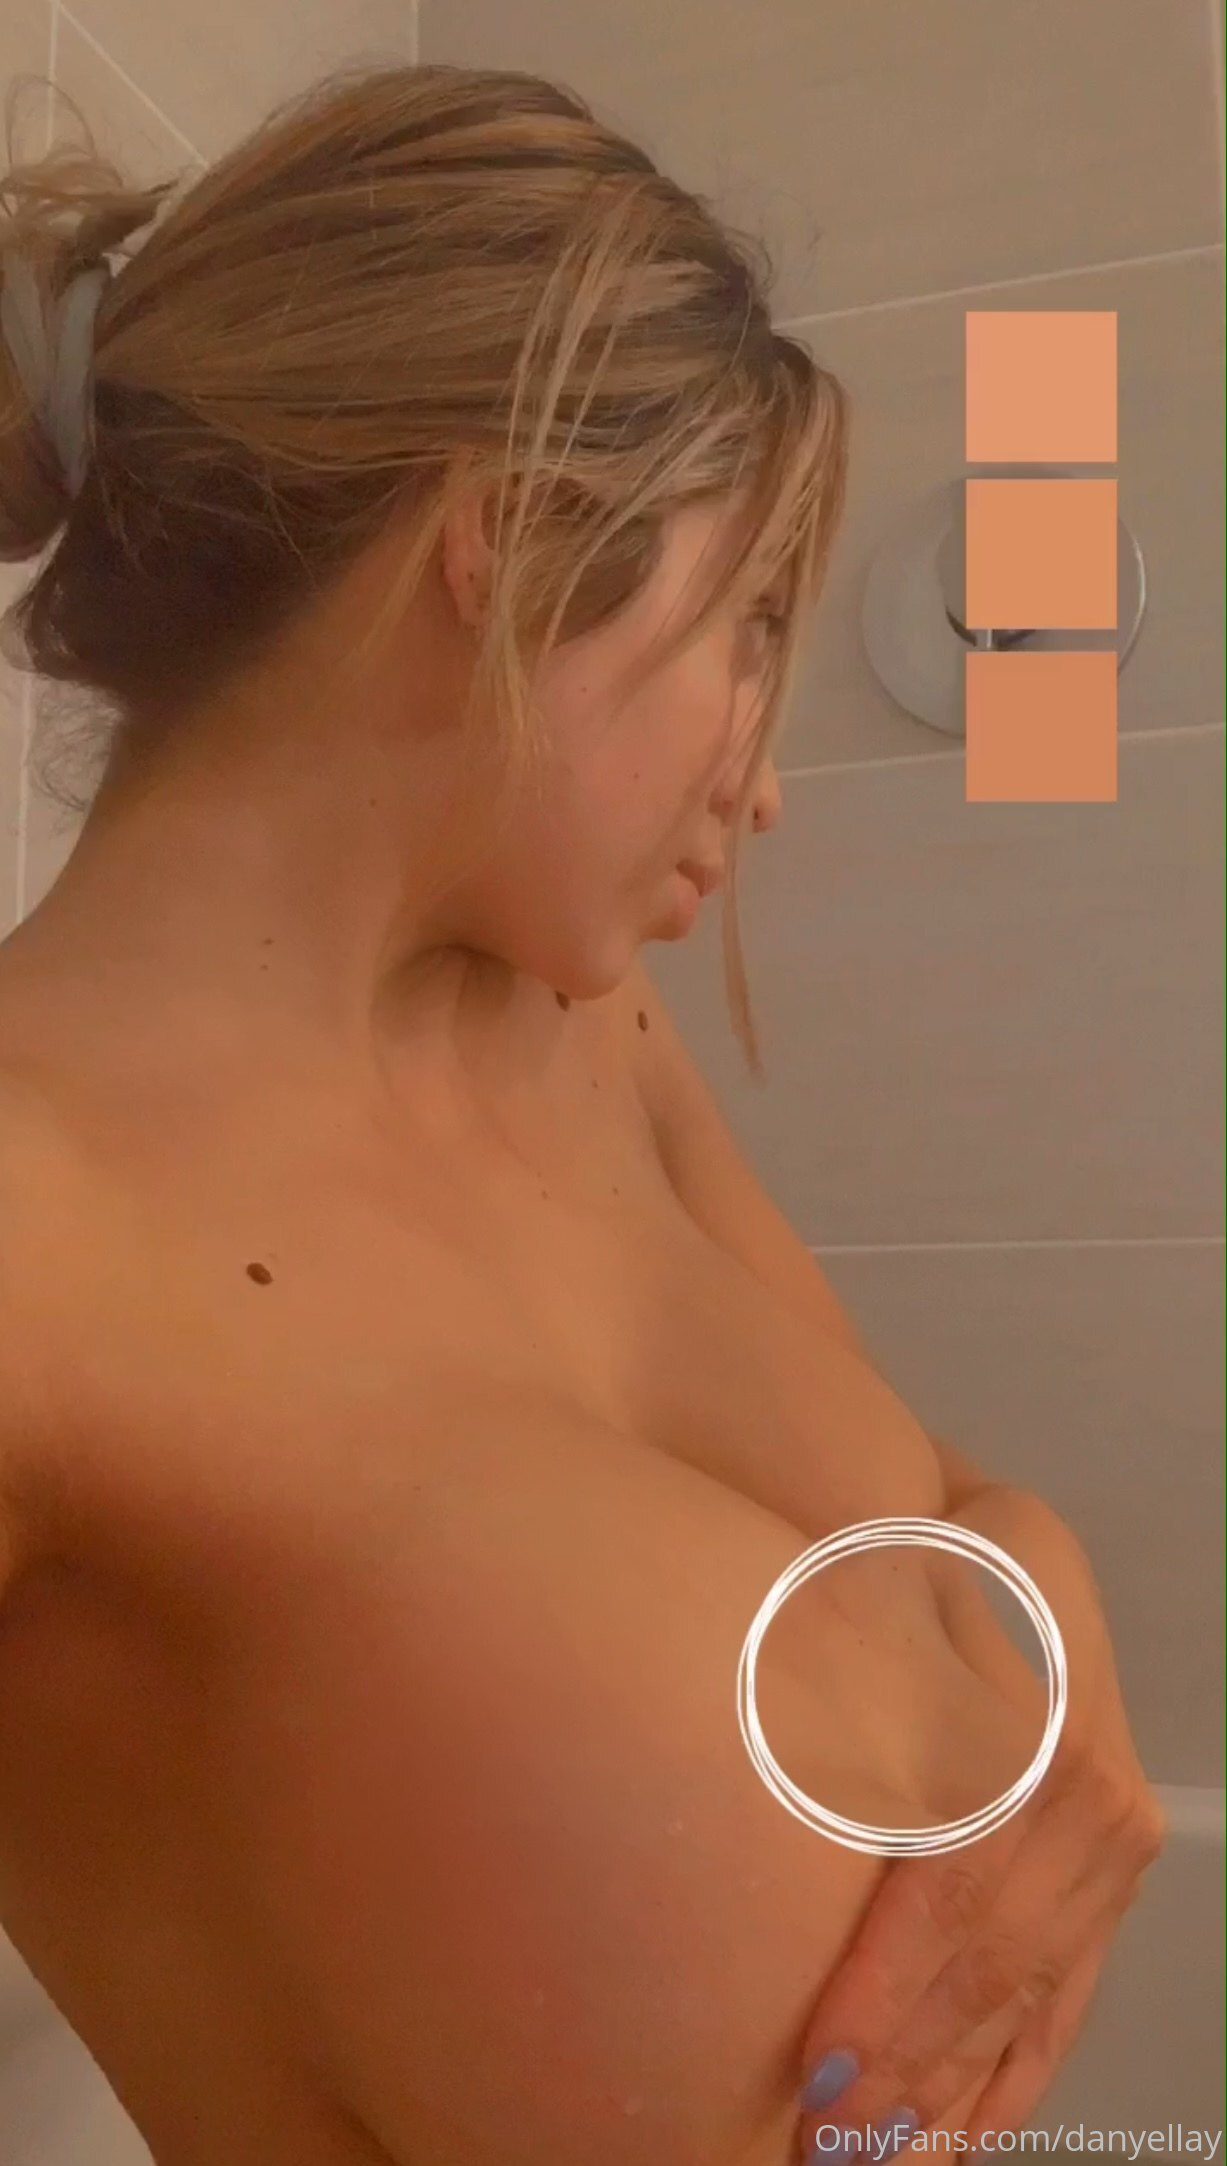 Danielley Ayala 0247